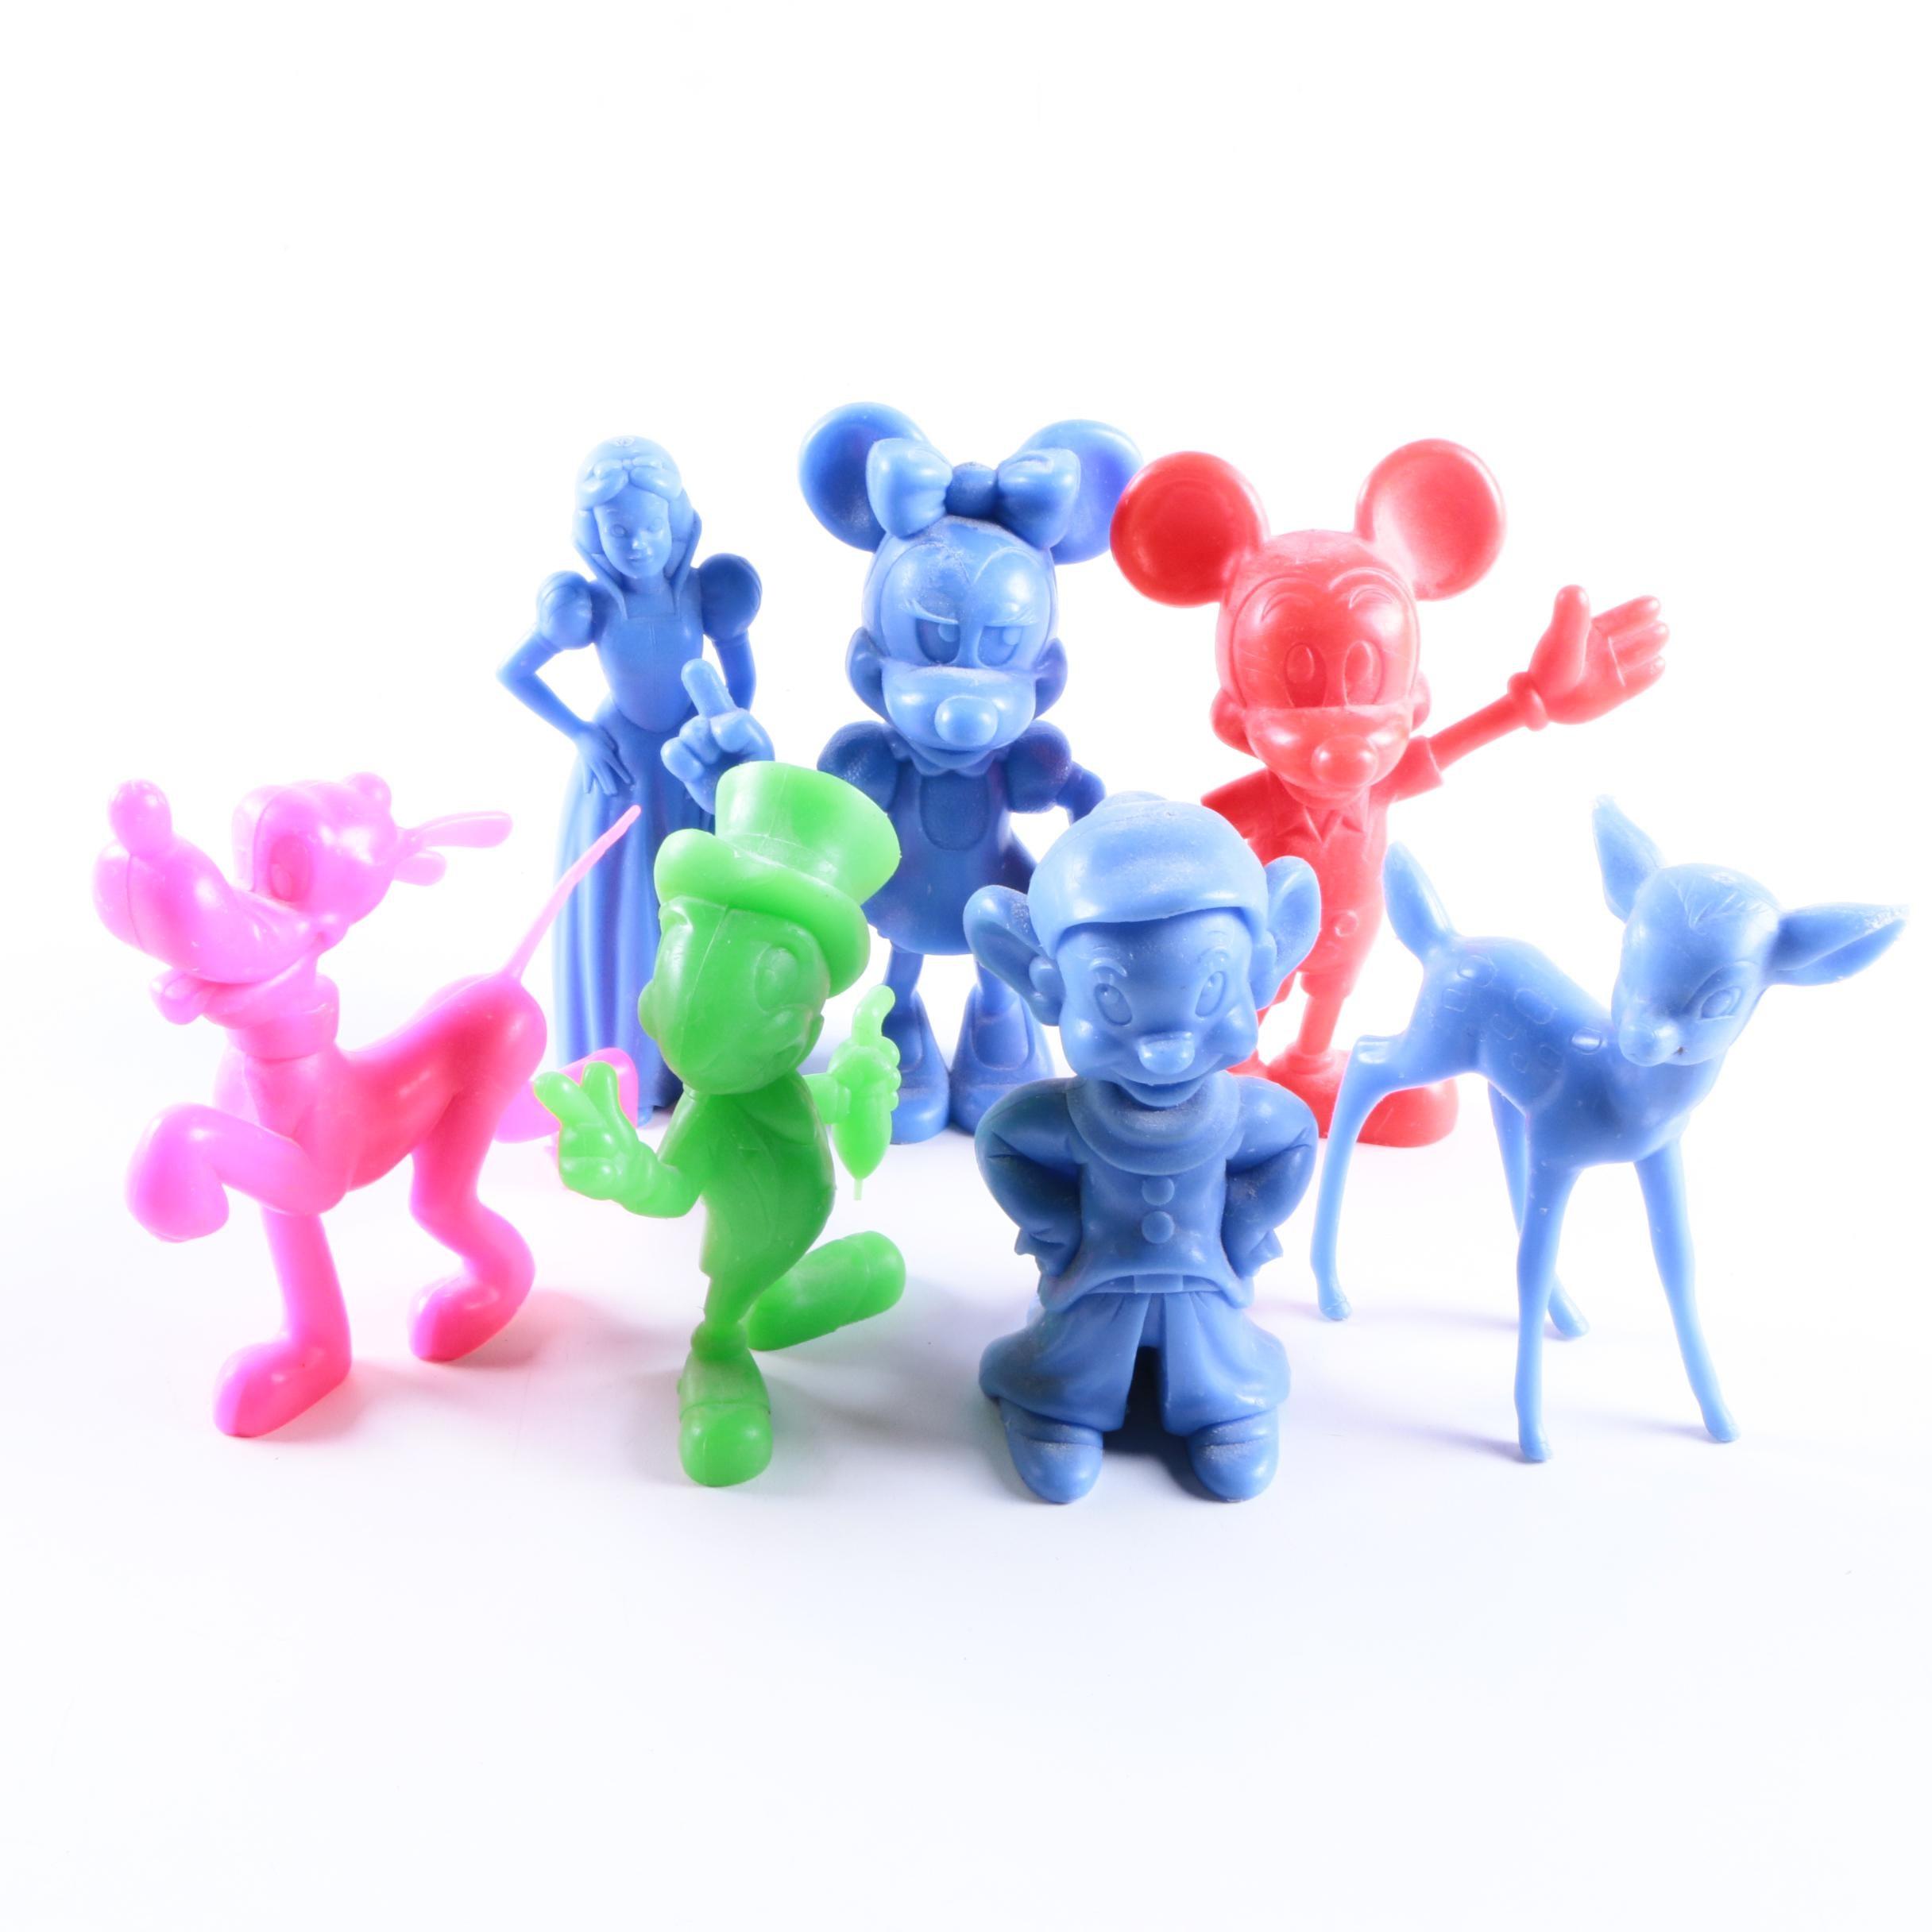 Plastic Disney Toys